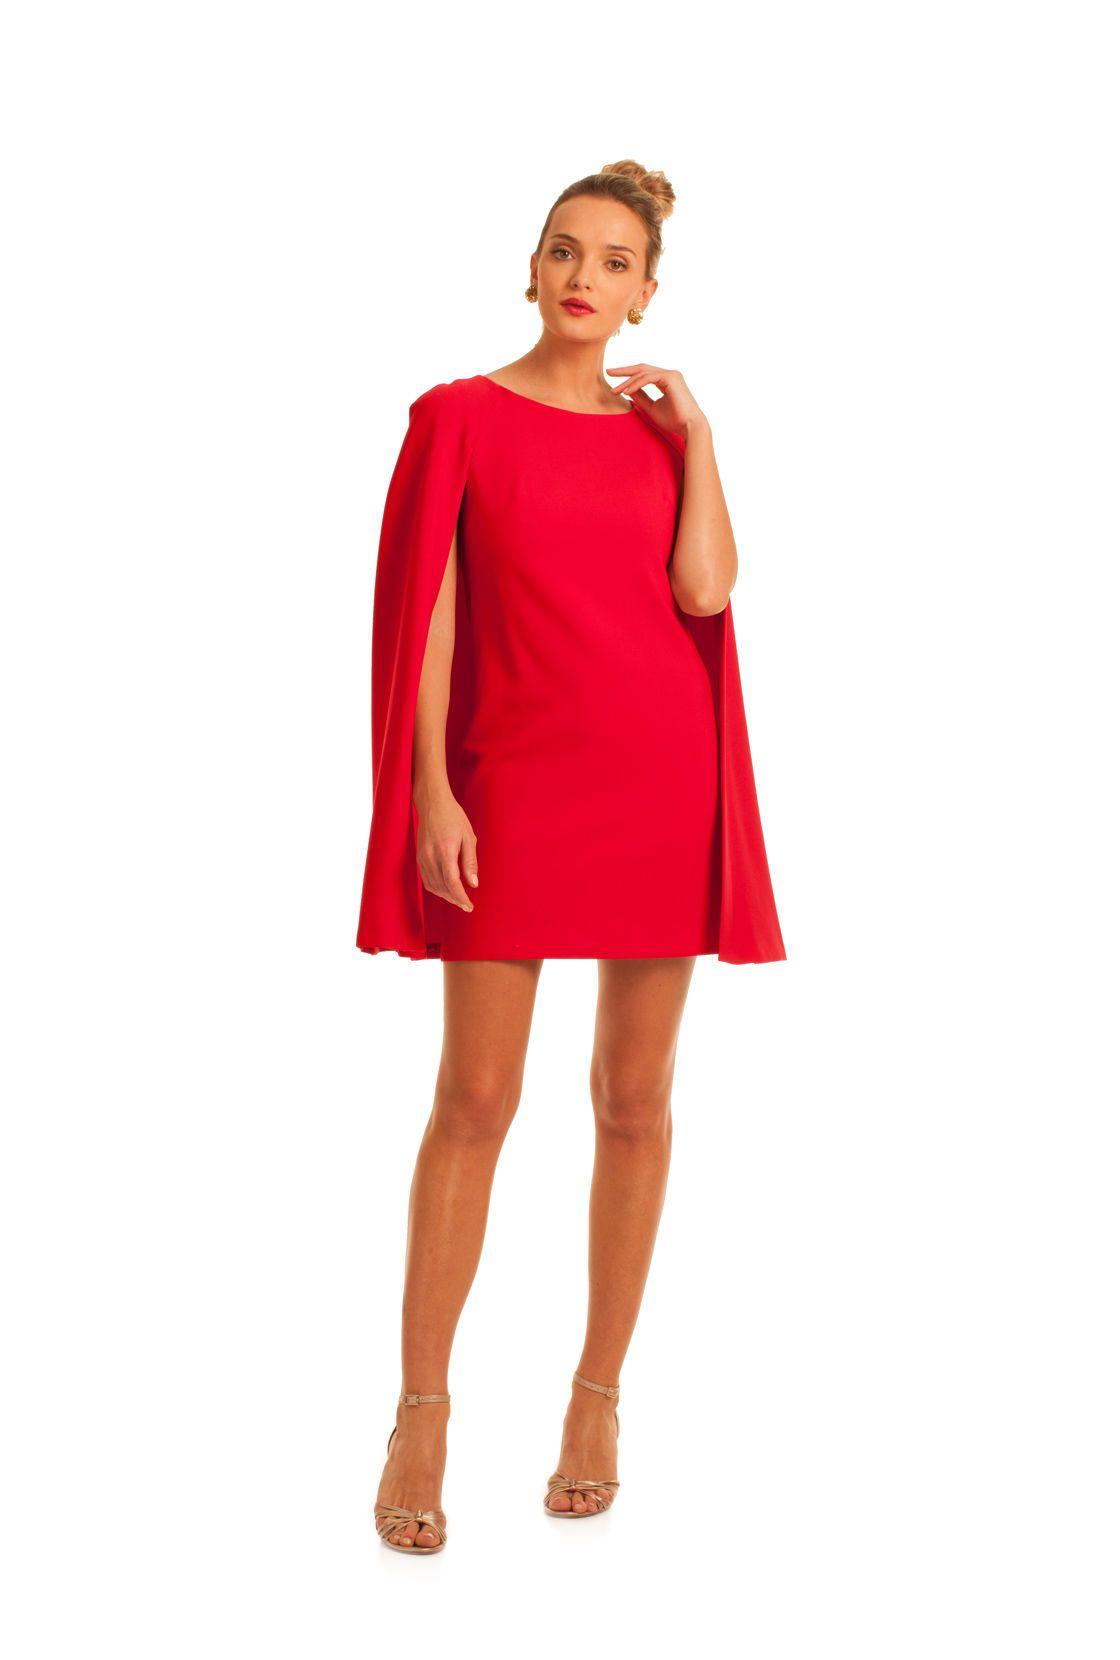 b9fdc07c920 Trina Turk cape dress (IN BLACK)